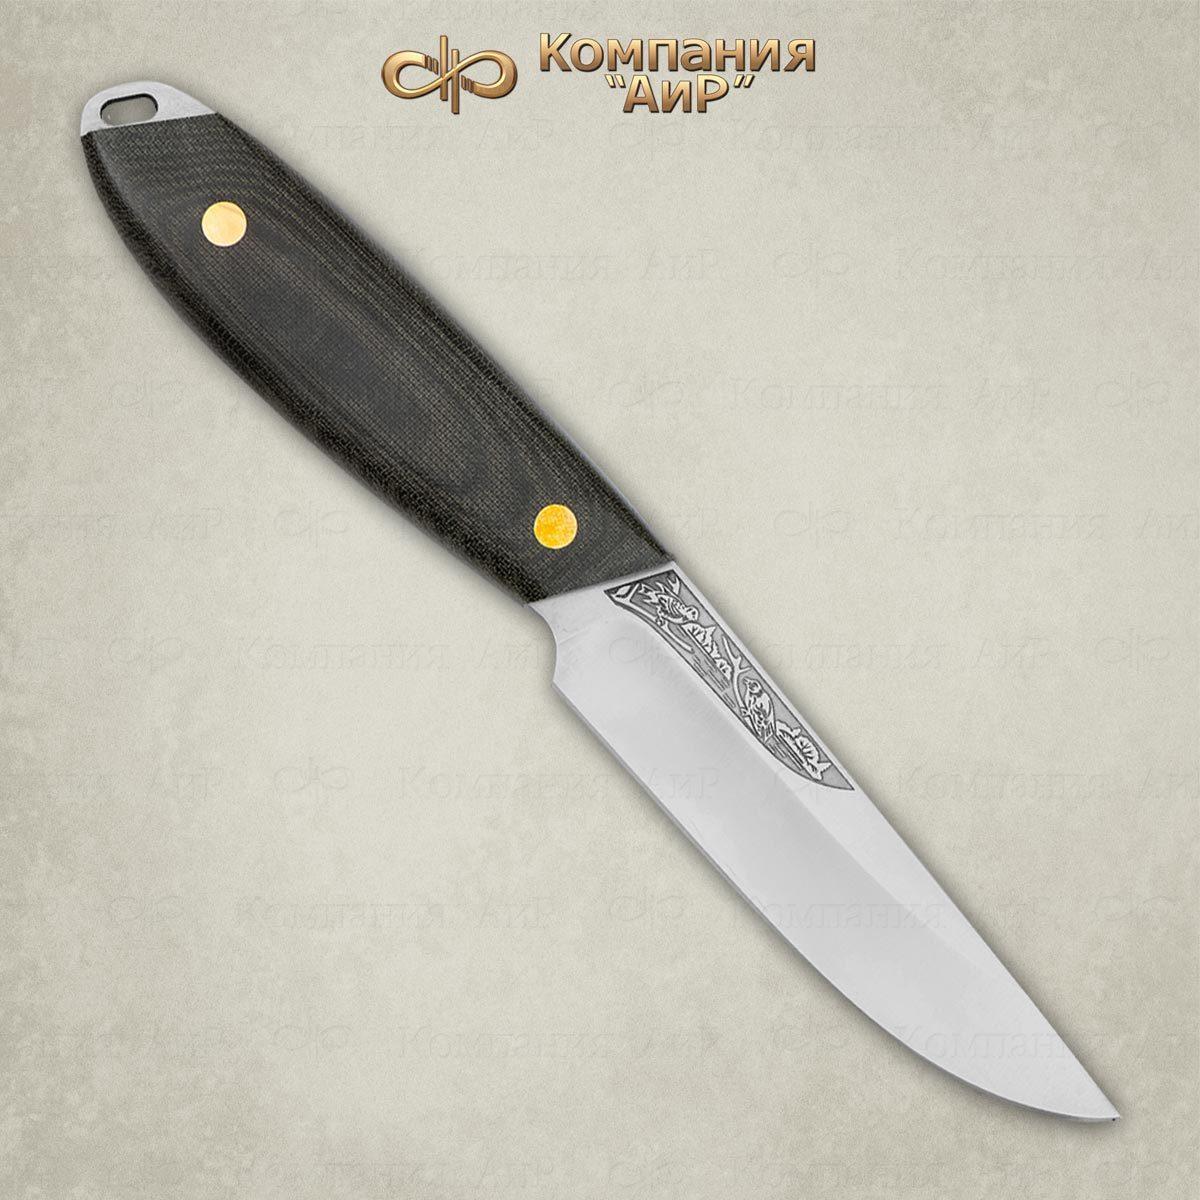 Нож разделочный АиР Жулан, сталь 95х18, рукоять текстолит